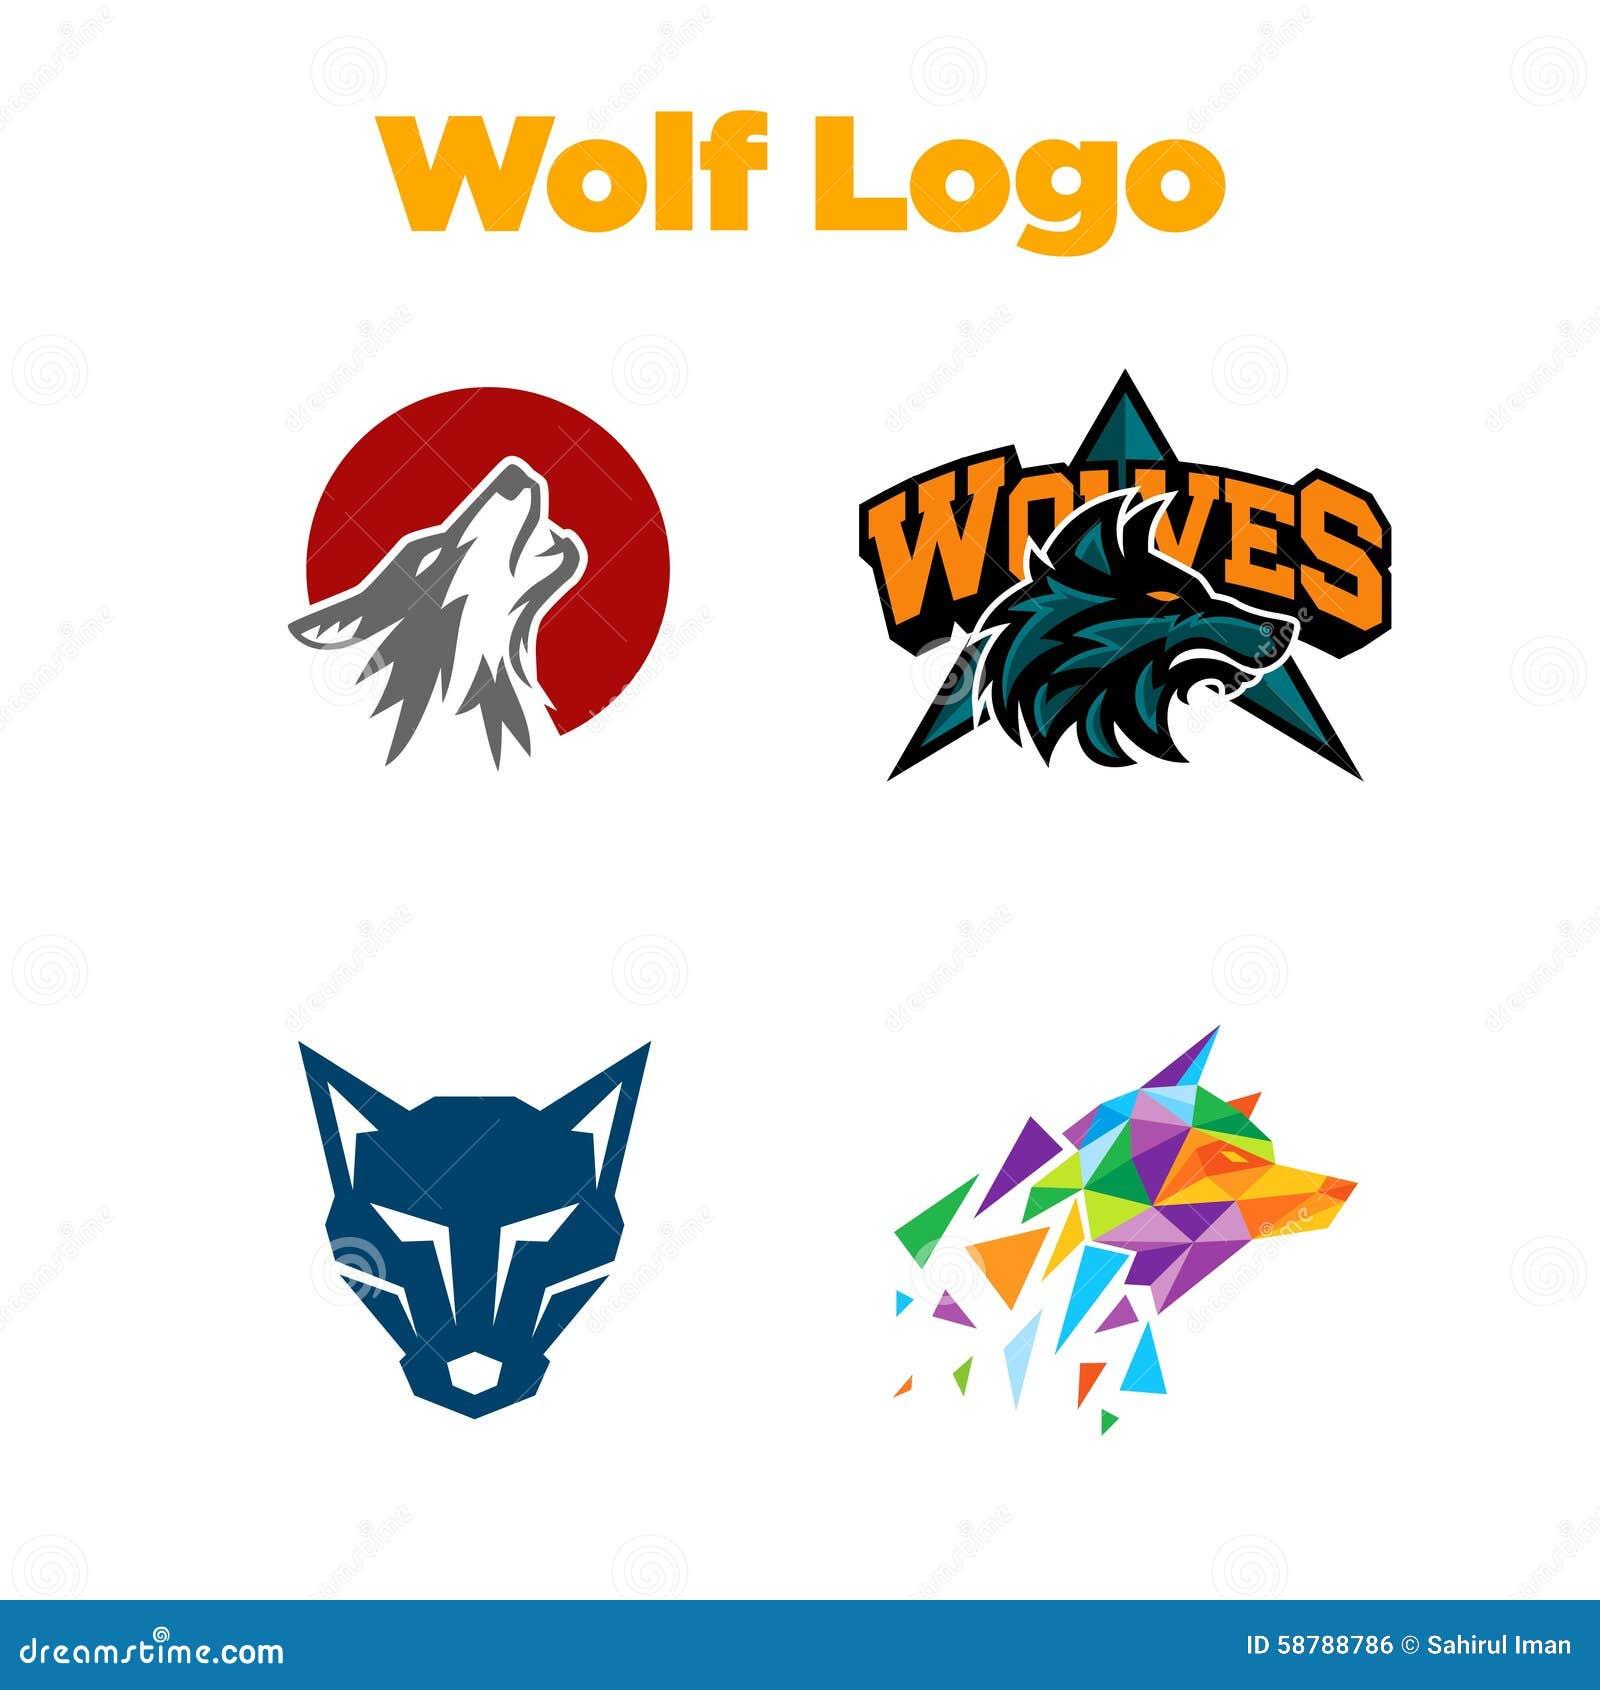 Wolf Logo Free Vector Art  20580 Free Downloads  Vecteezy